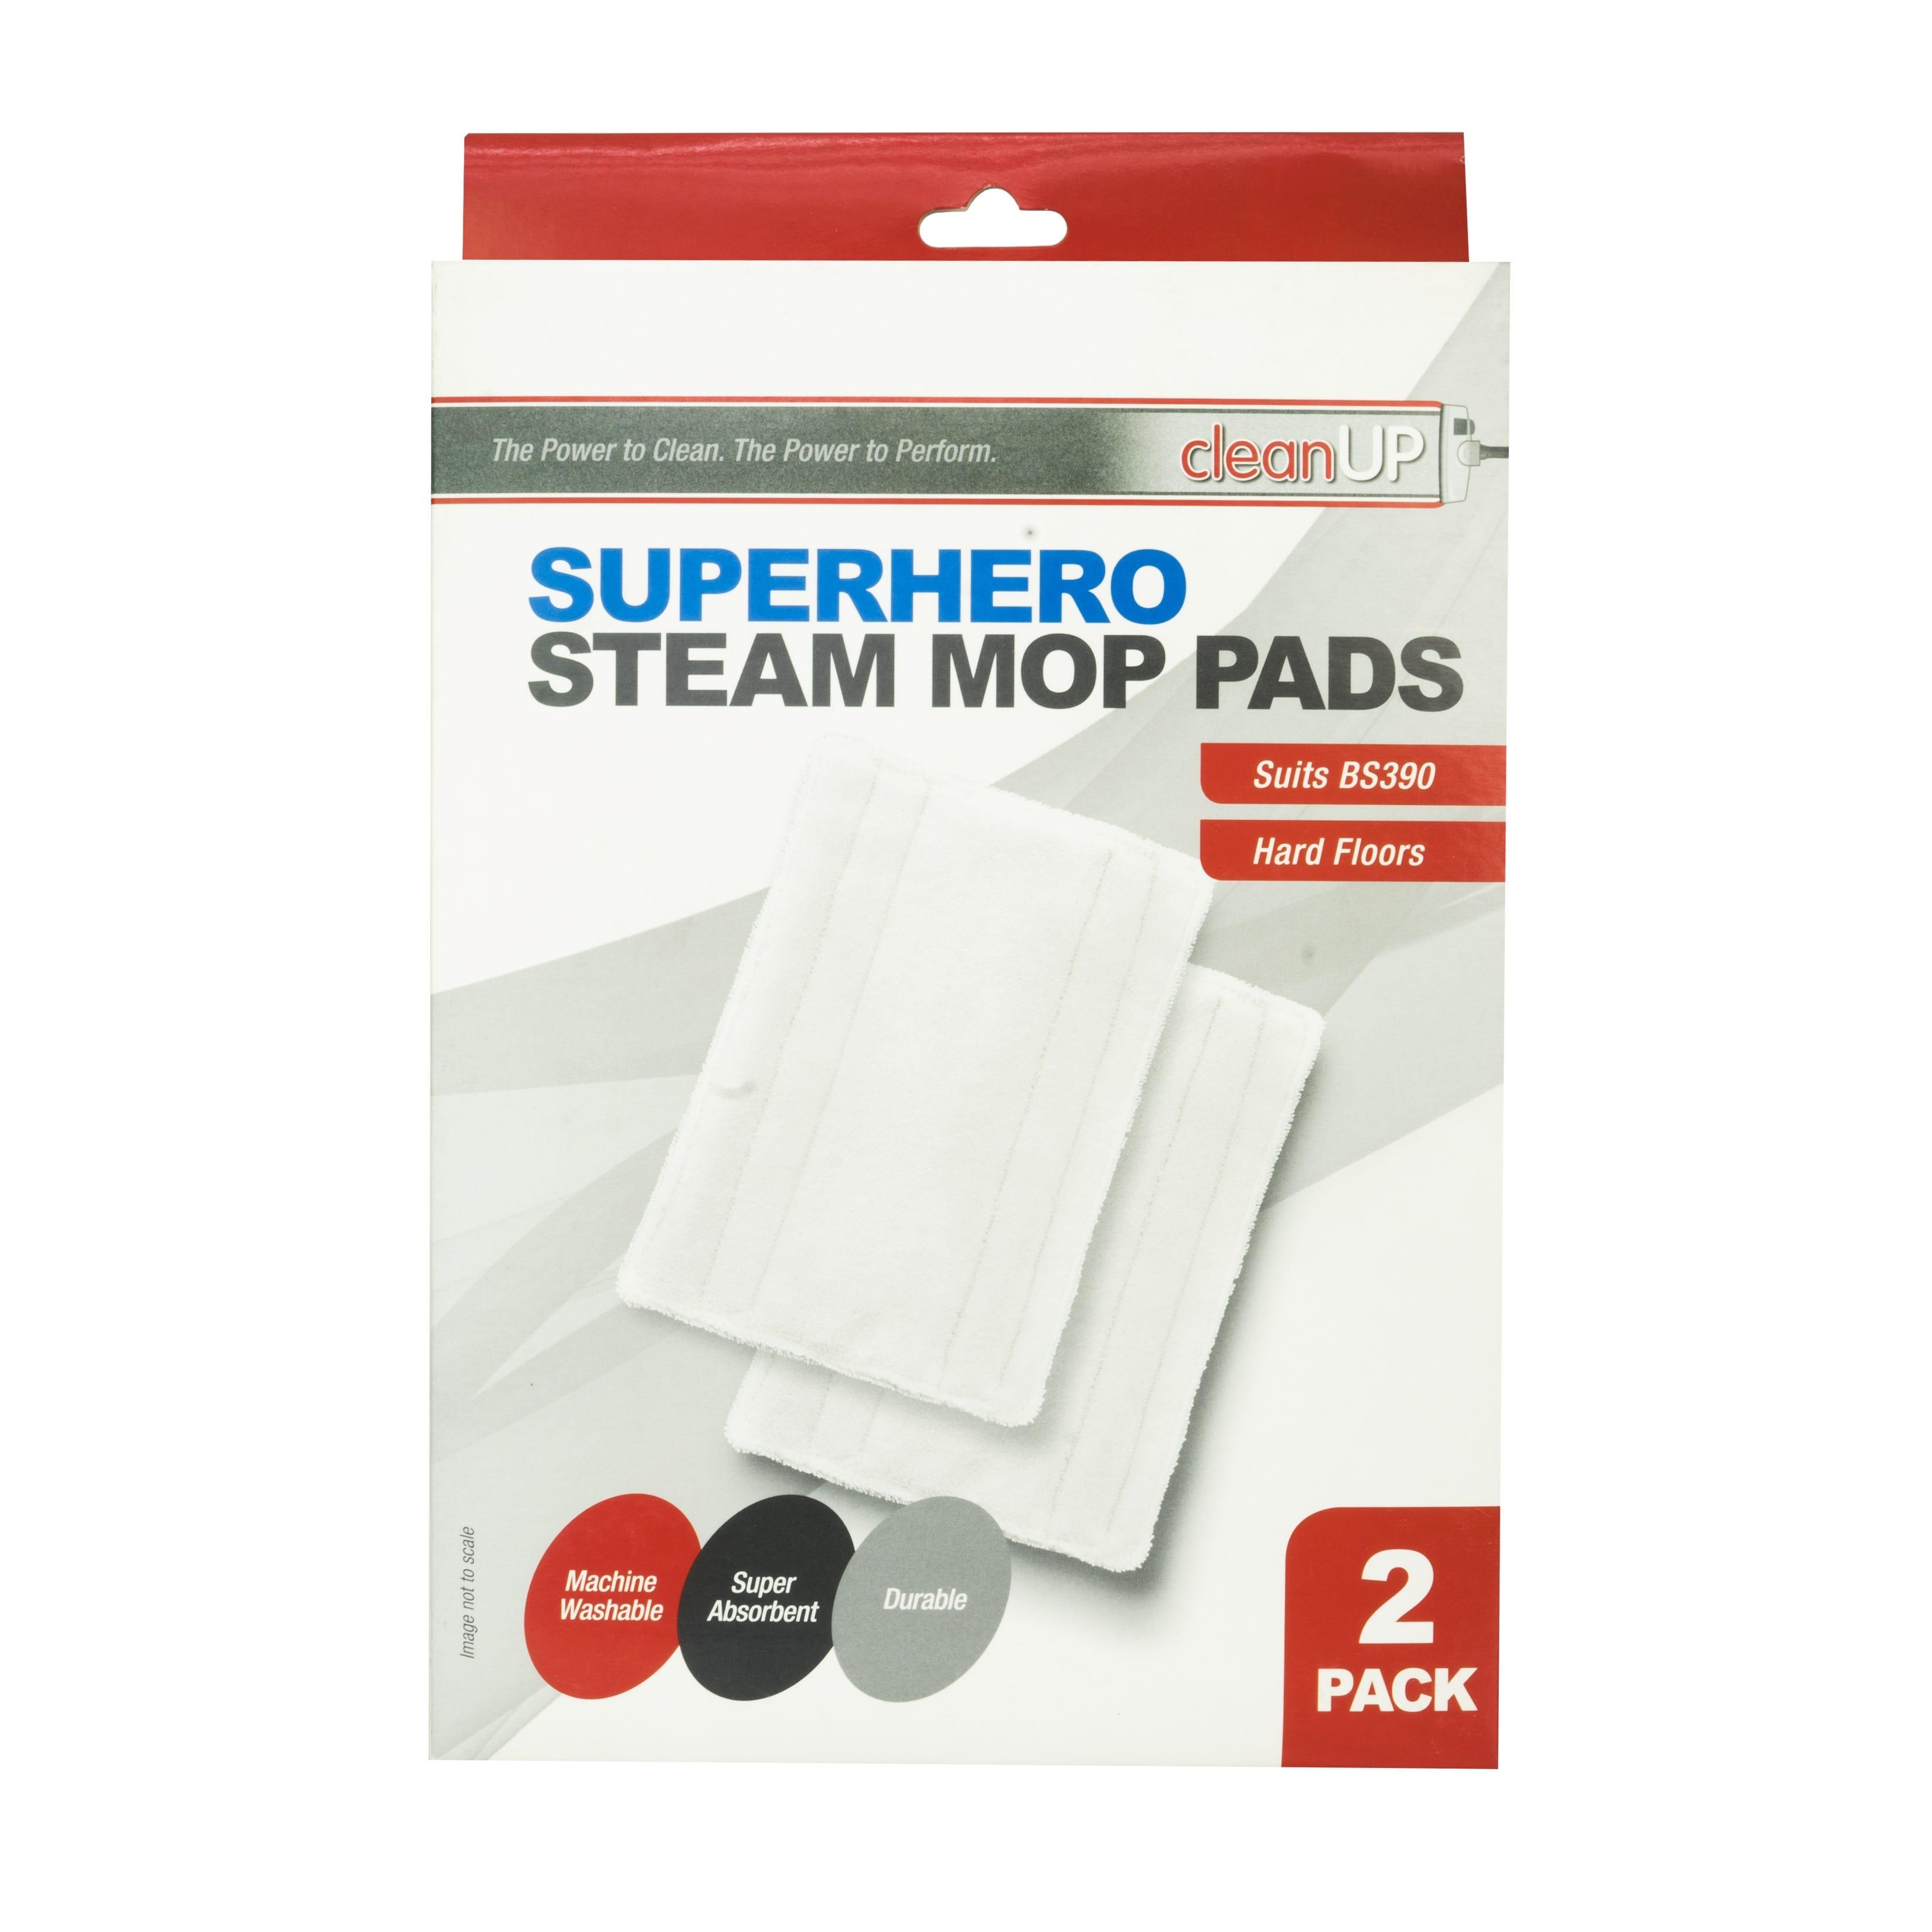 Clean Up Superhero Steam Mop Pads 2pk Washable Reusable